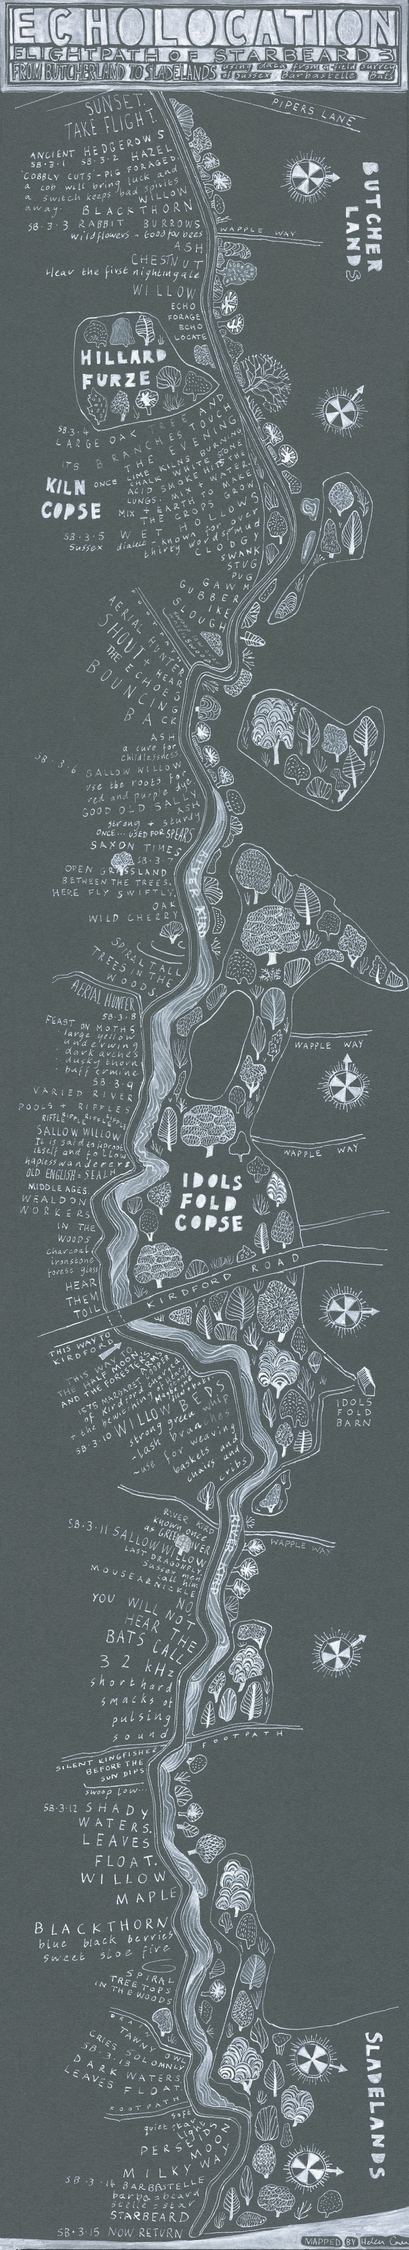 annotated map bat flight, creat - helencann | ello